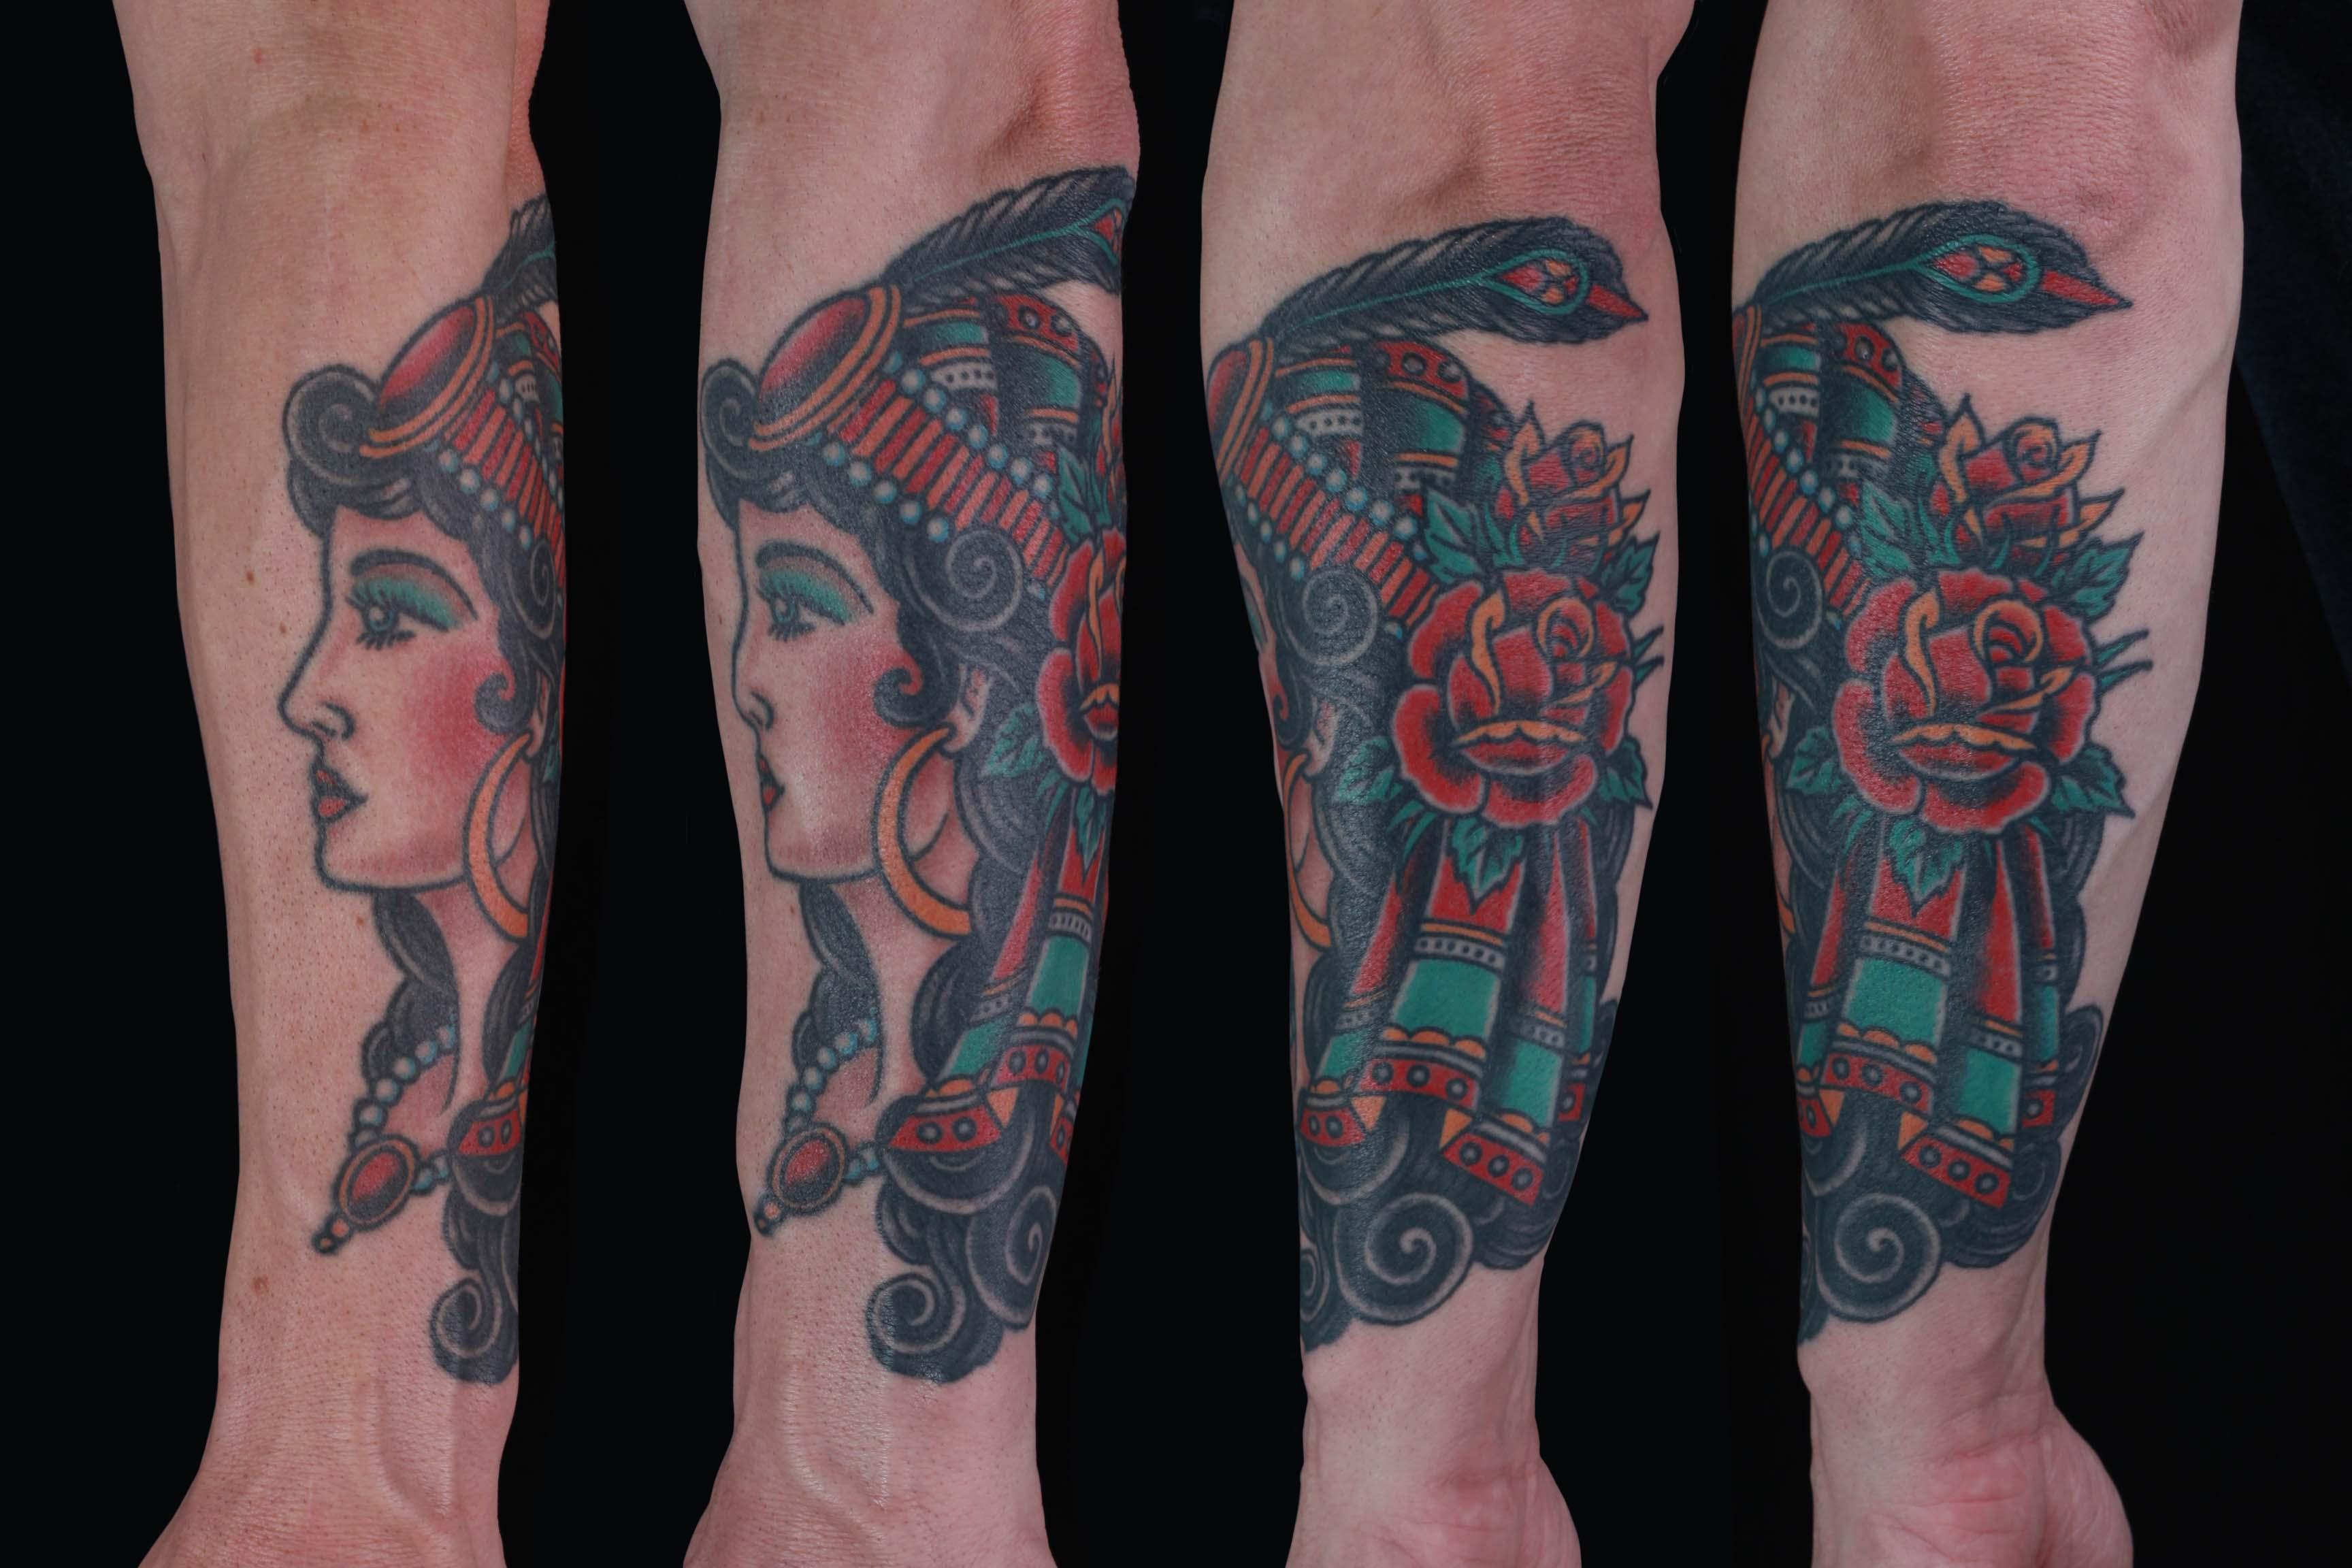 brian-thurow-dedication-tattoo-traditional-girl-gypsy-scarf-roses-forearm